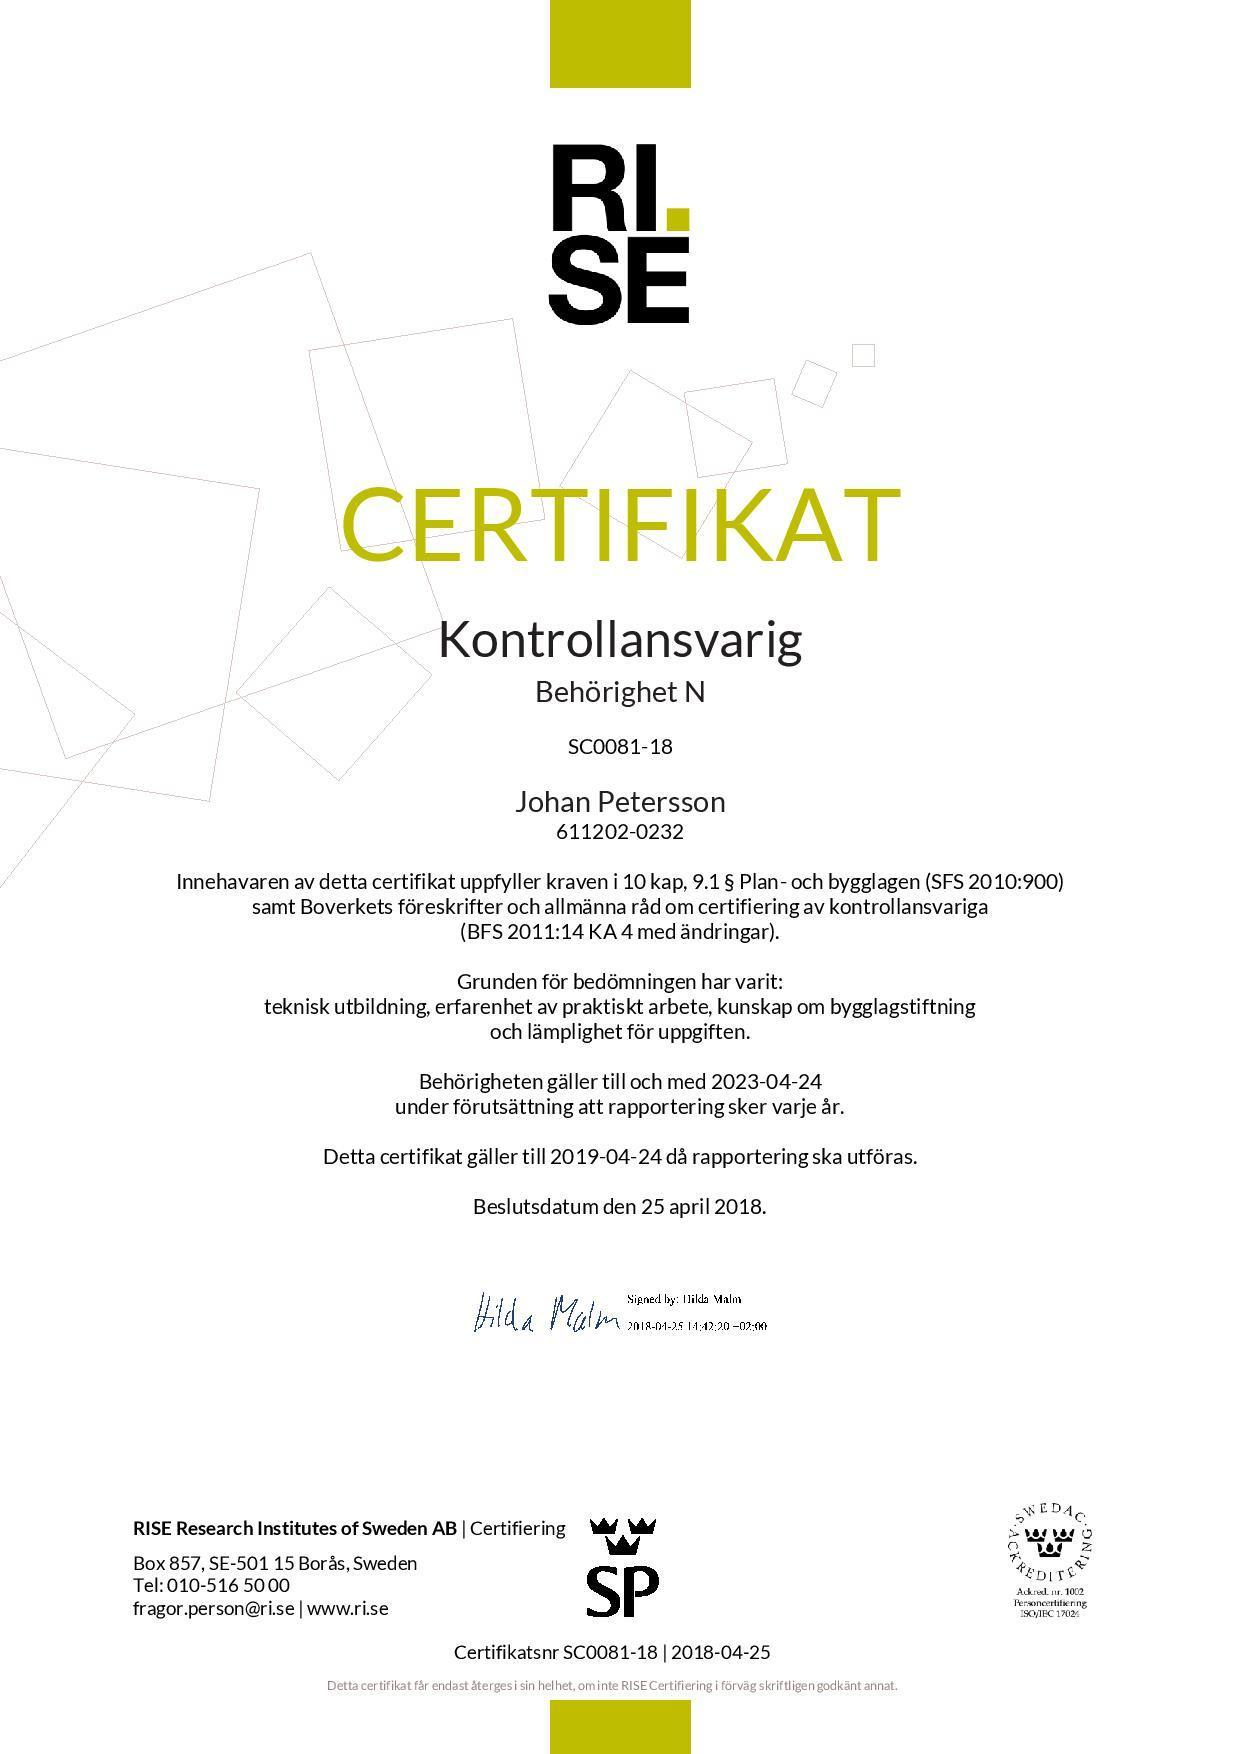 Certifikat Kontrollansvarig